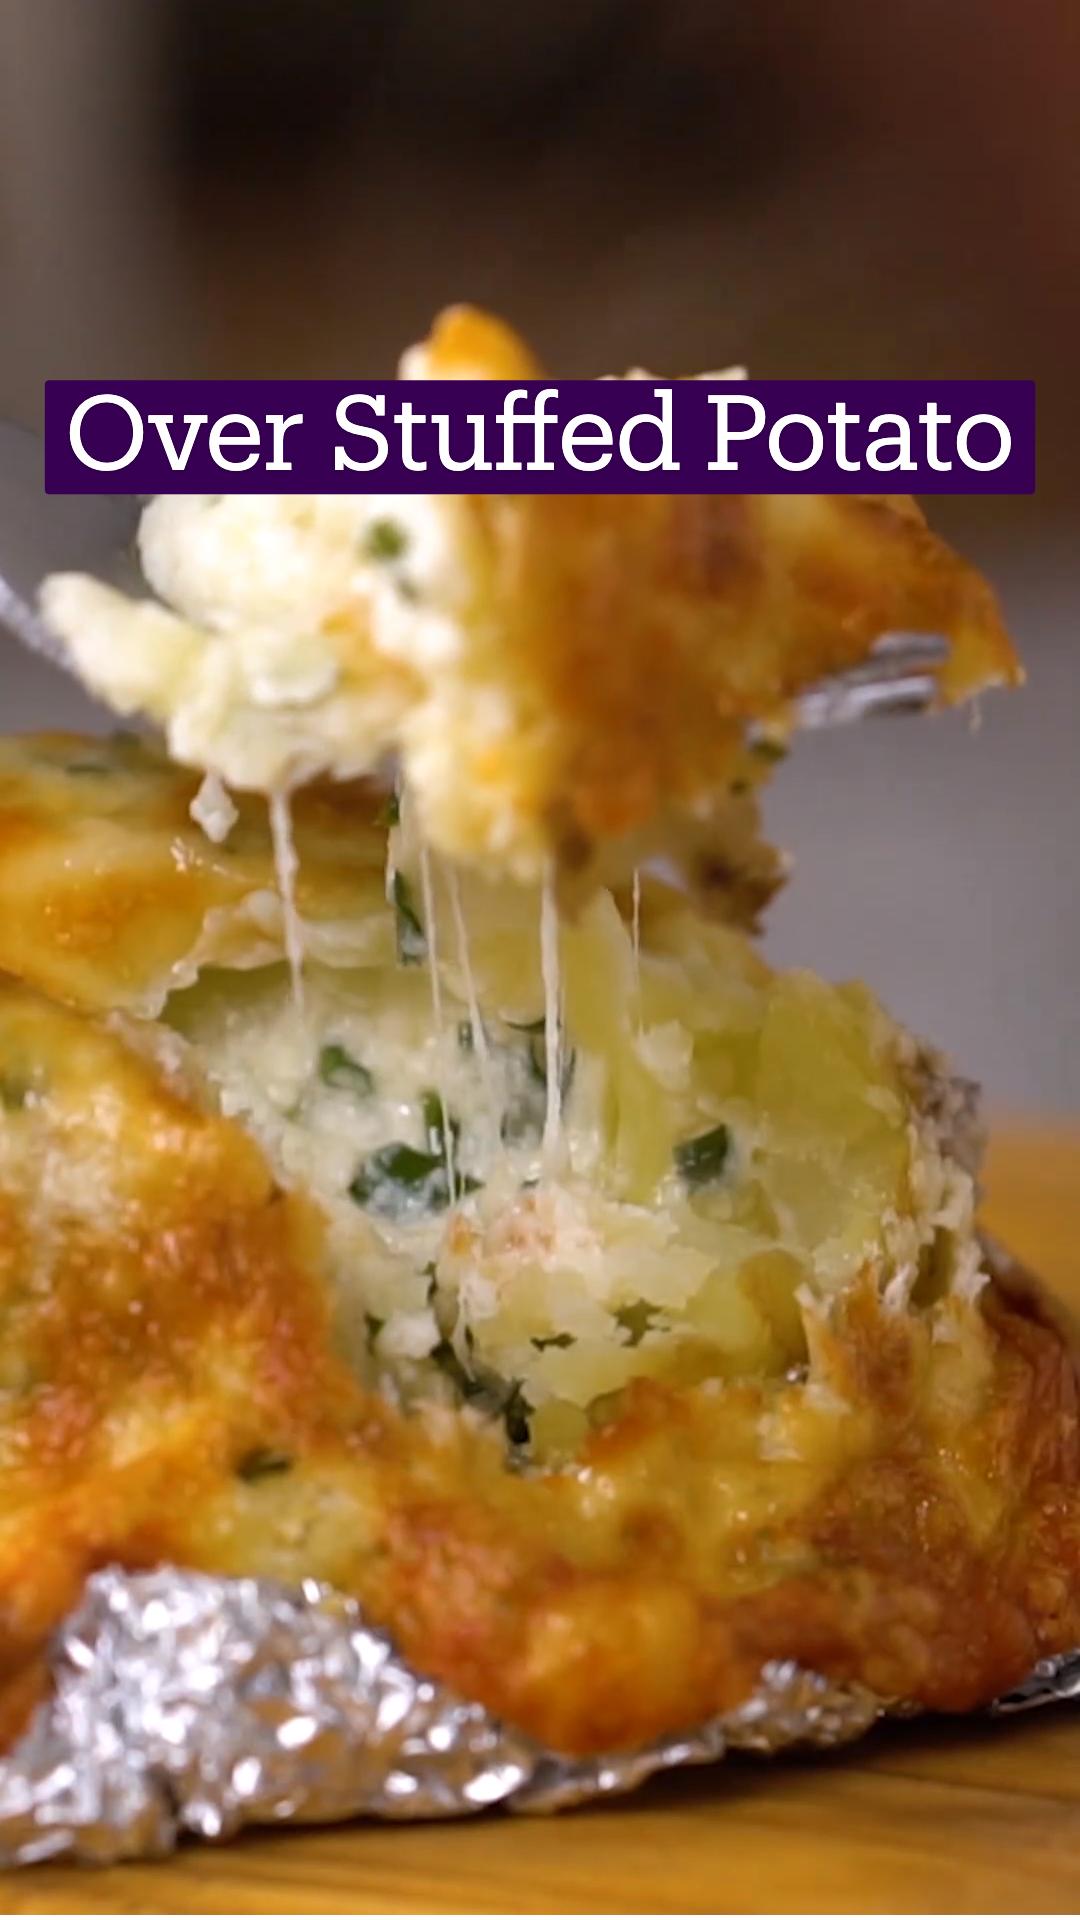 Over Stuffed Potato